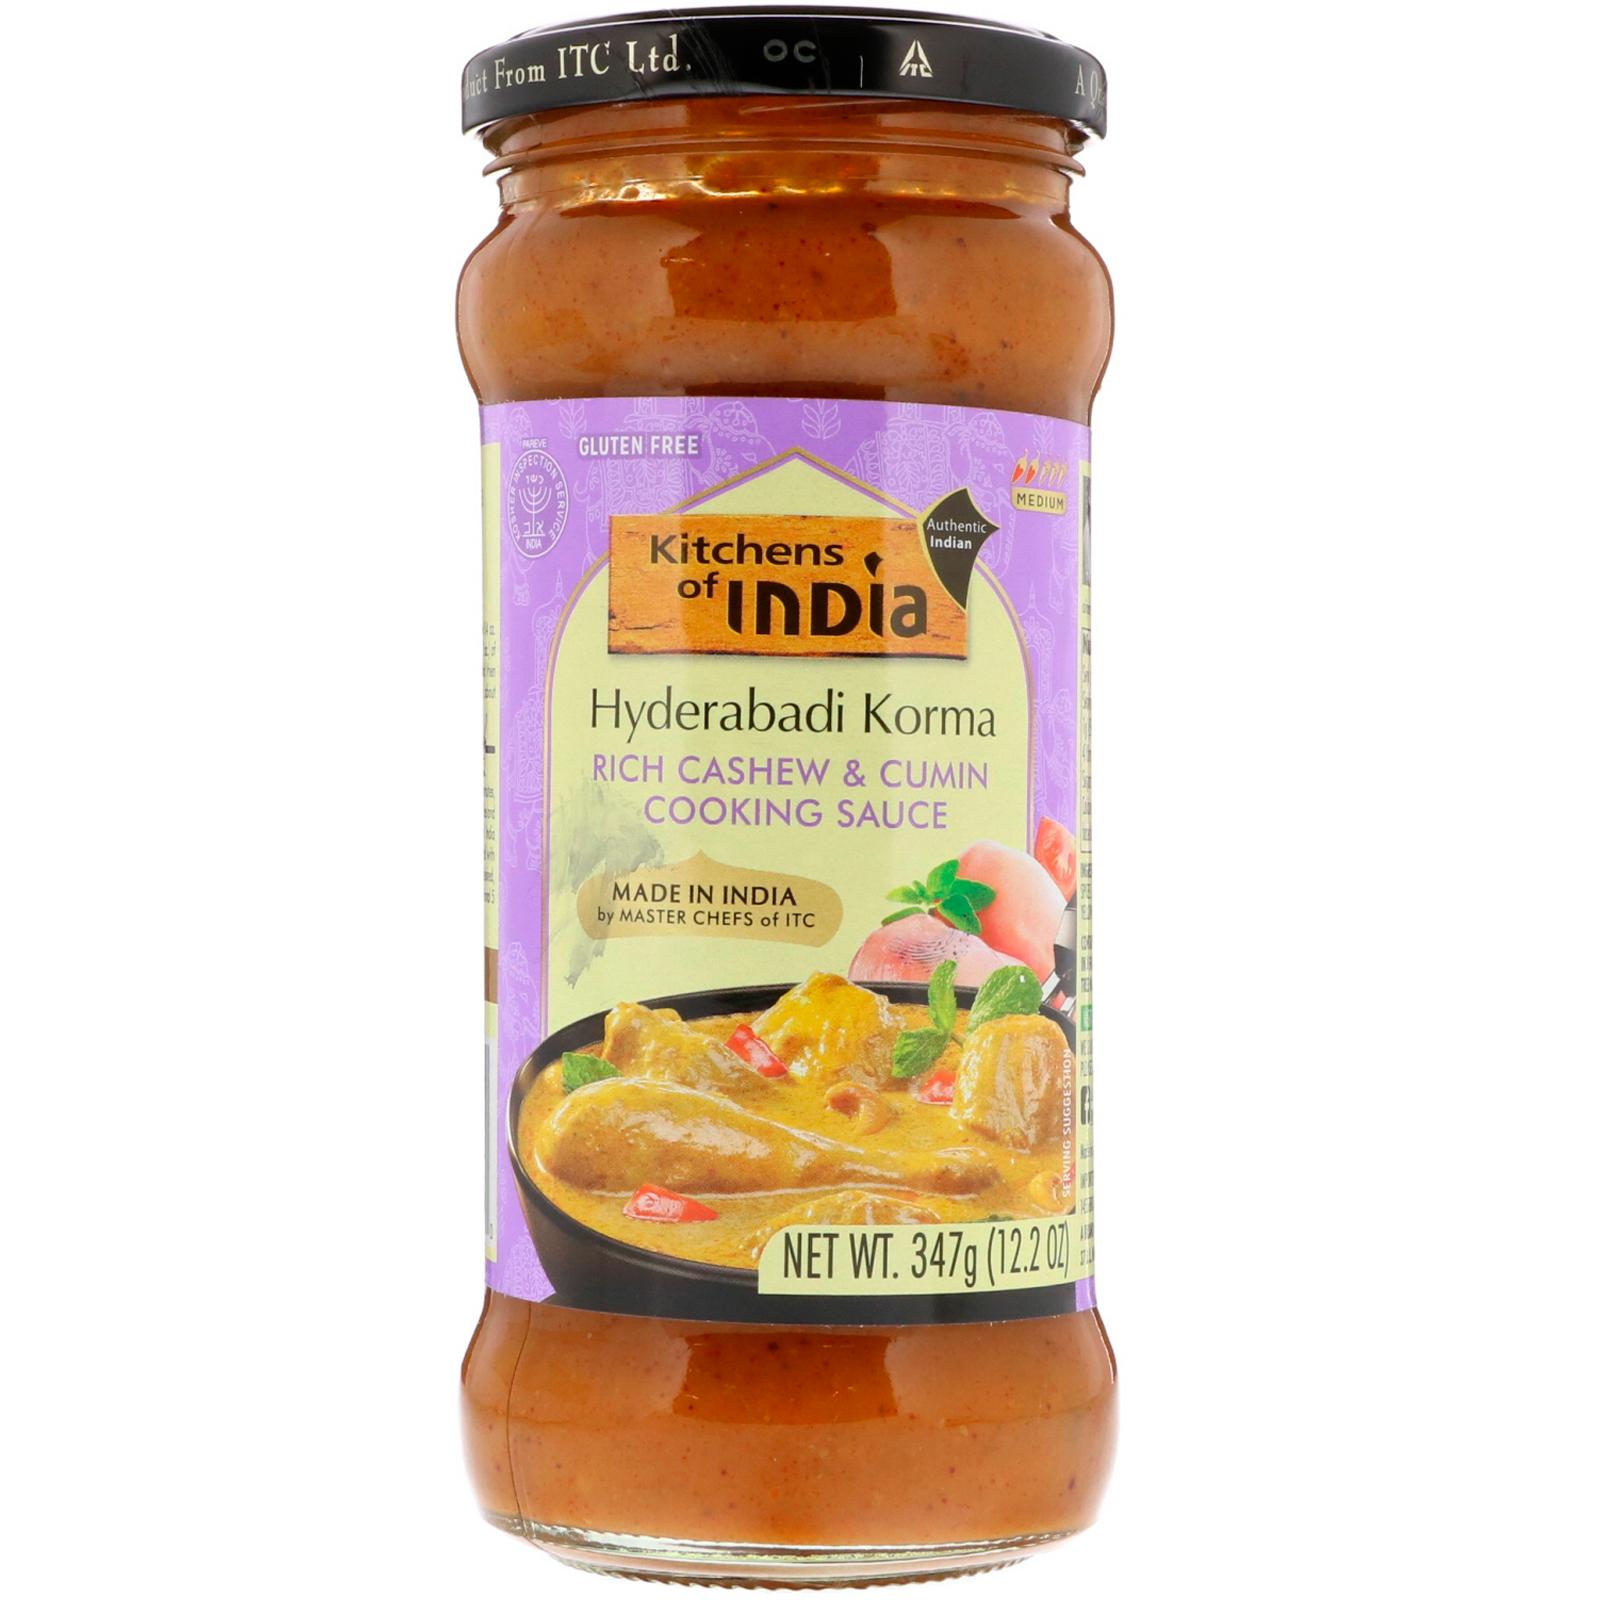 Kitchens Of India, Hyderabadi Korma, Rich Cashew U0026 Cumin Cooking Sauce,  Medium,